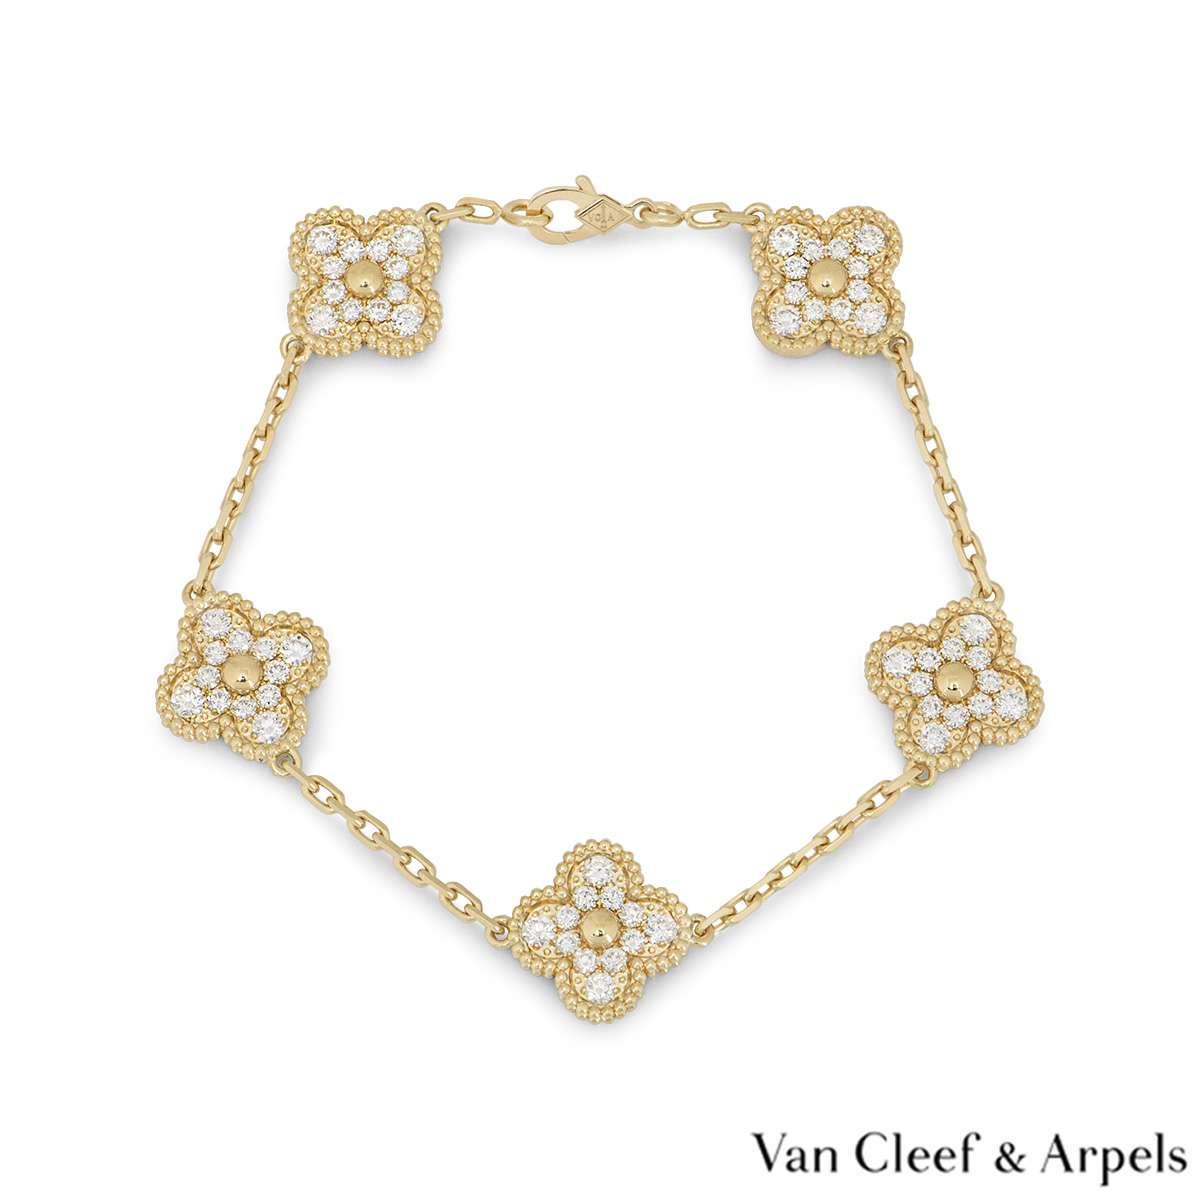 Van Cleef & Arpels Vintage Alhambra Bracelet VCARA41400